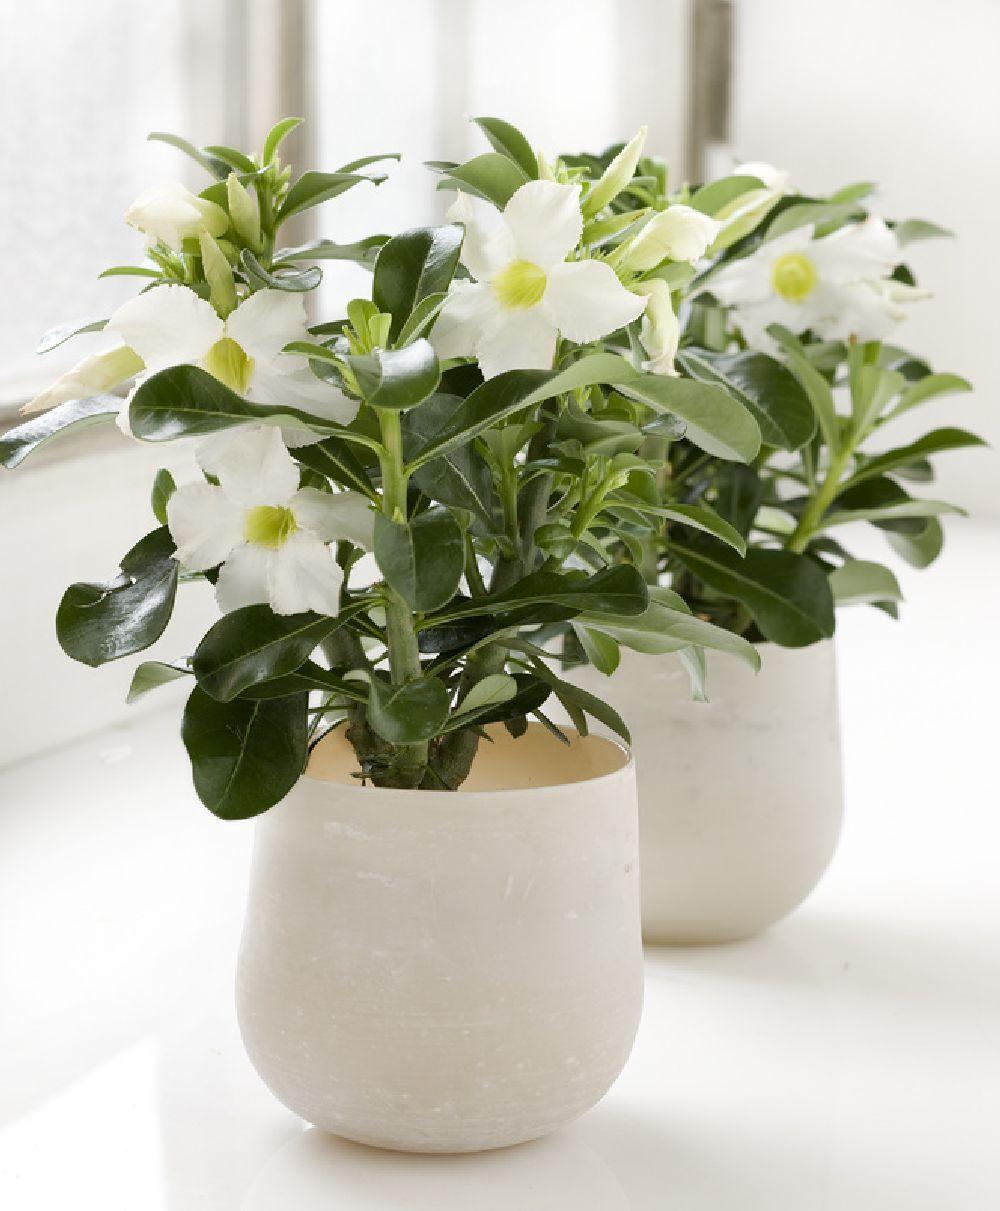 adelaparvu.com despre plante la ghiveci deosebite, Text Carli Marian, In foto Adenium obesum, Foto Floradania (3)